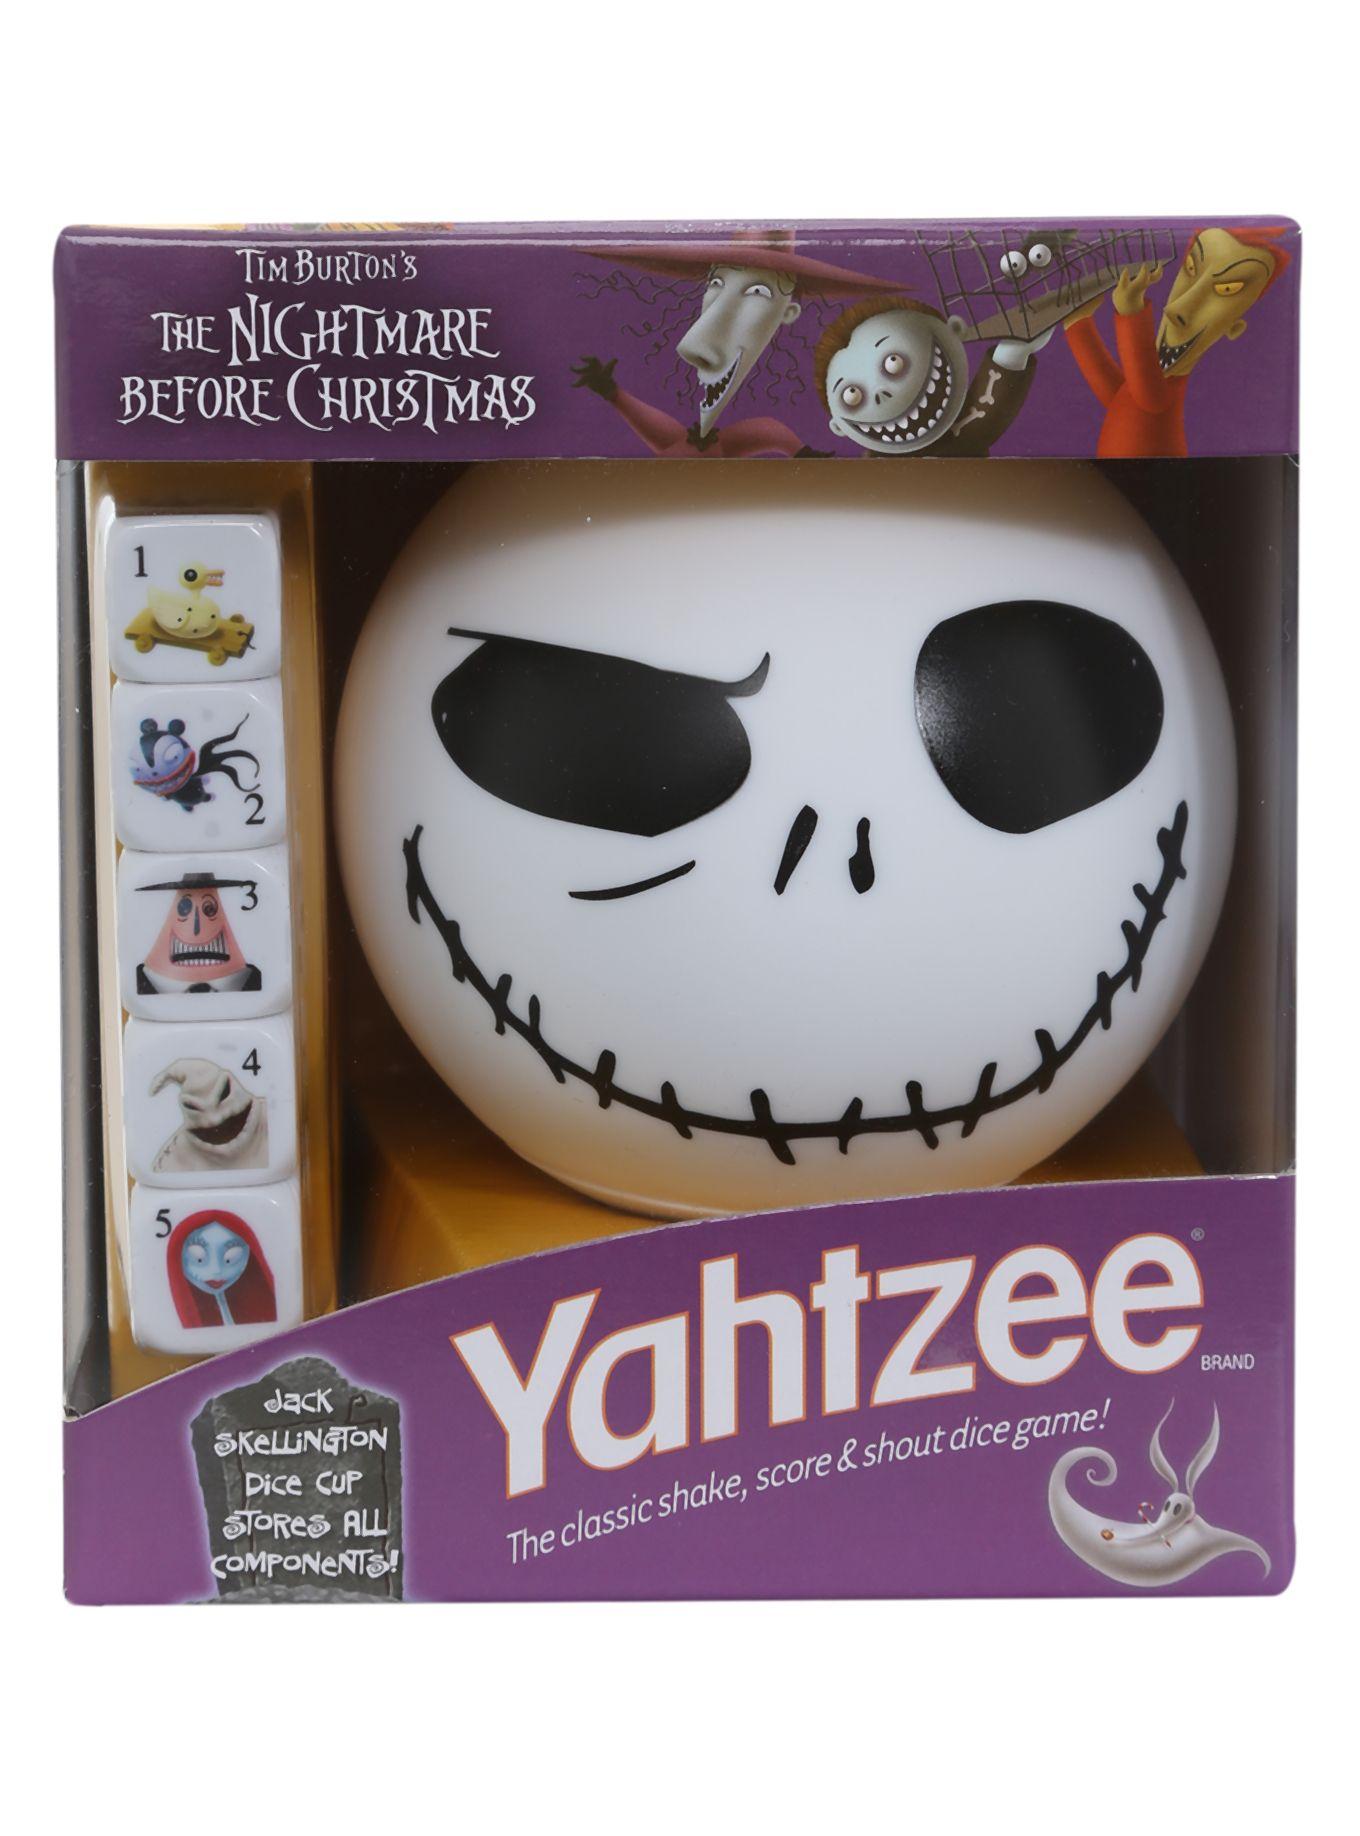 The Nightmare Before Christmas Yahtzee Game | Hot Topic | My Style ...